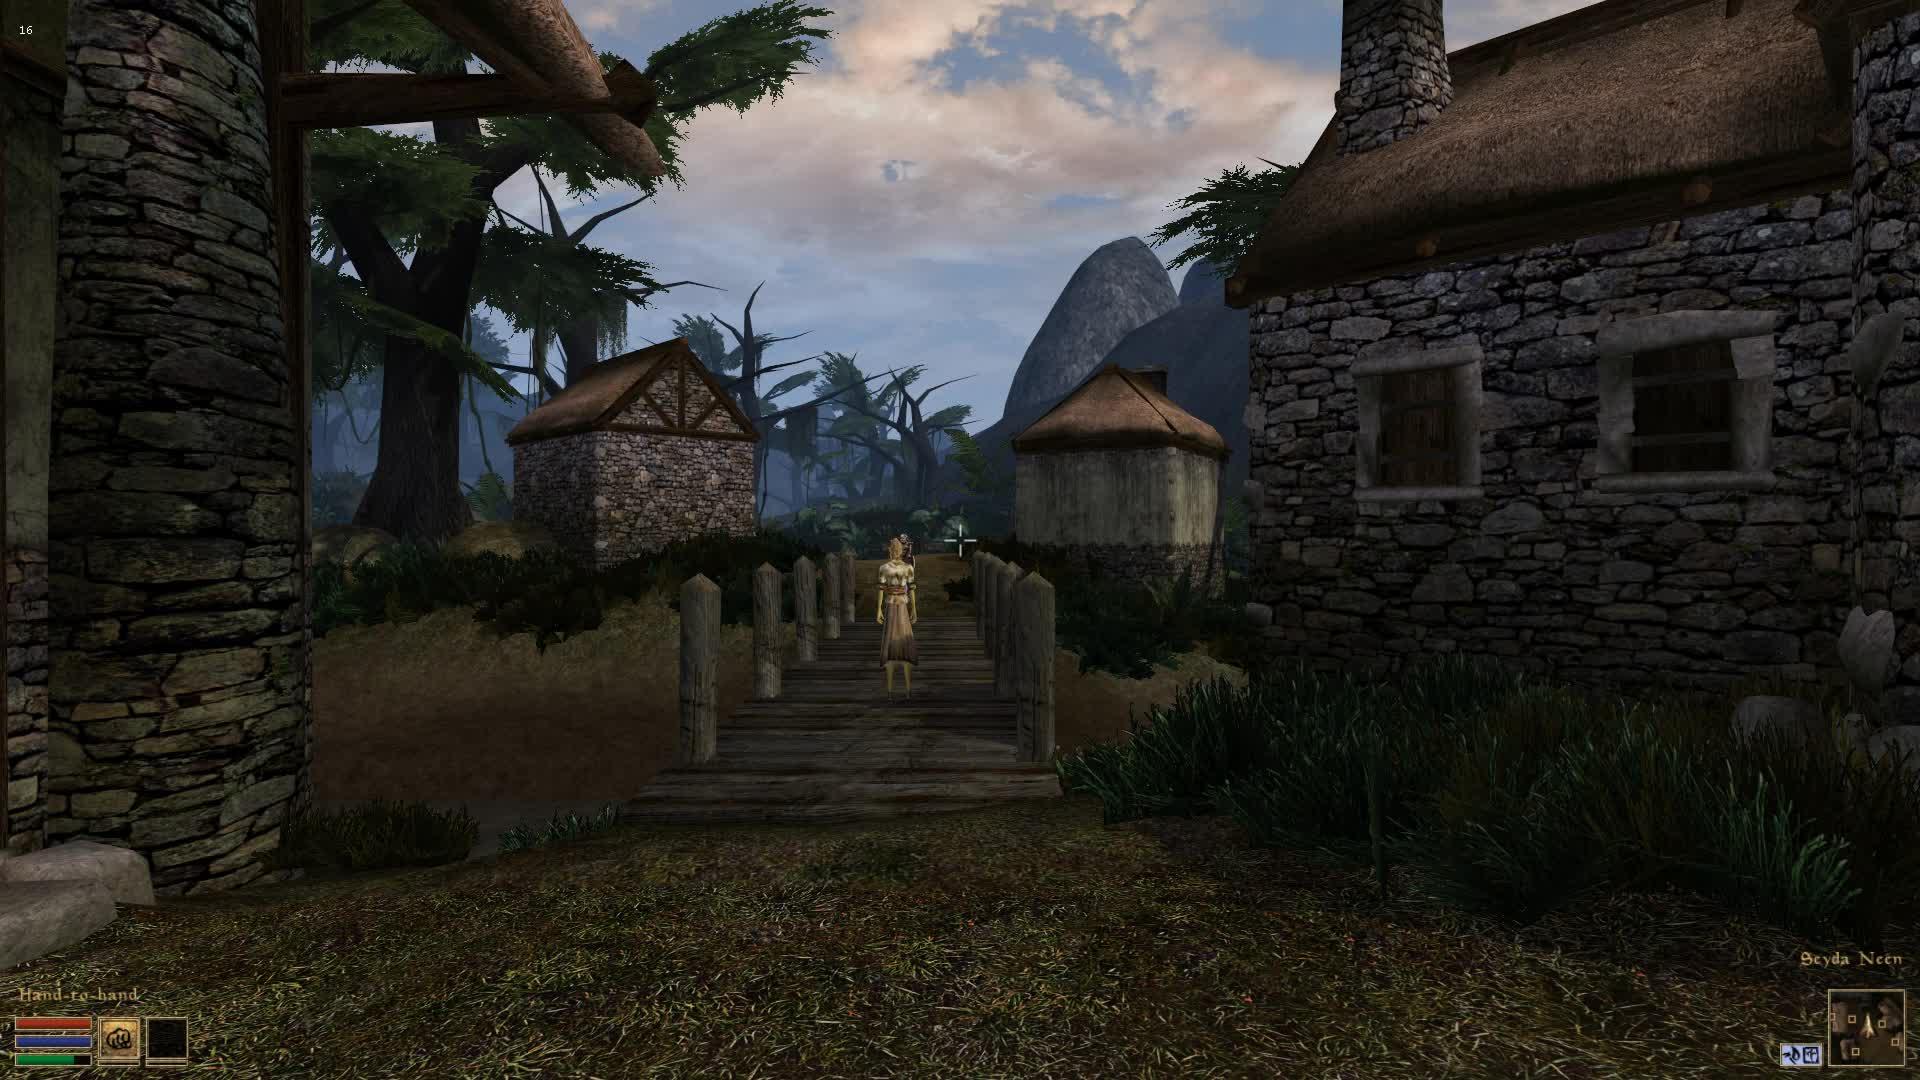 Elder Scrolls 3 Morrowind 2018.12.22 - 00.25.45.01.mp4-00.00.03.216-00.00.16.167 GIFs